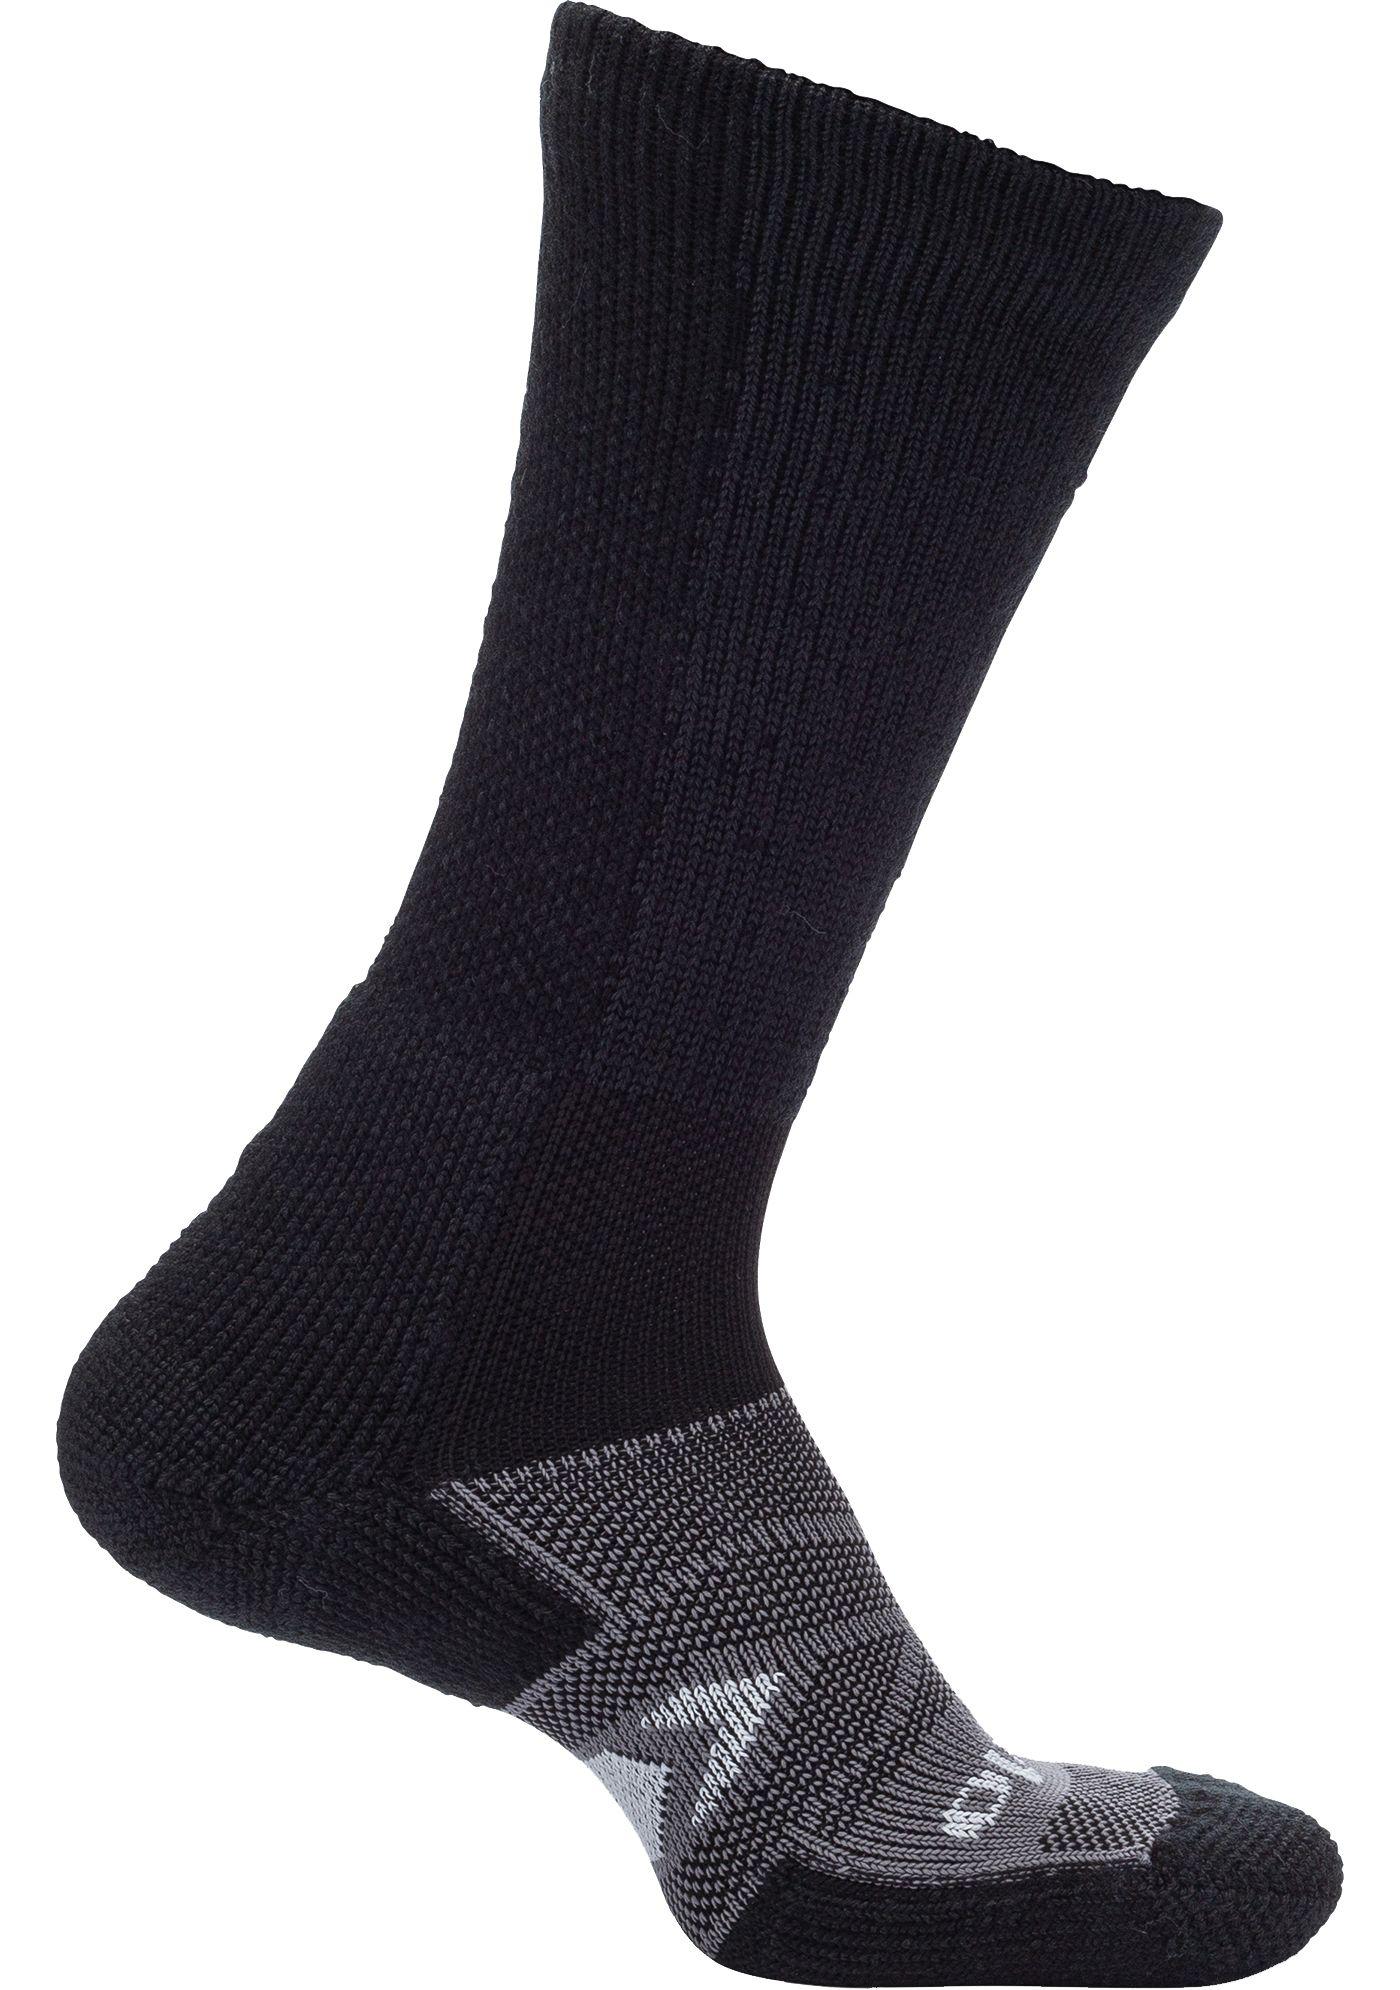 Thor-Lo 12 Hour Shift at Work Crew Socks